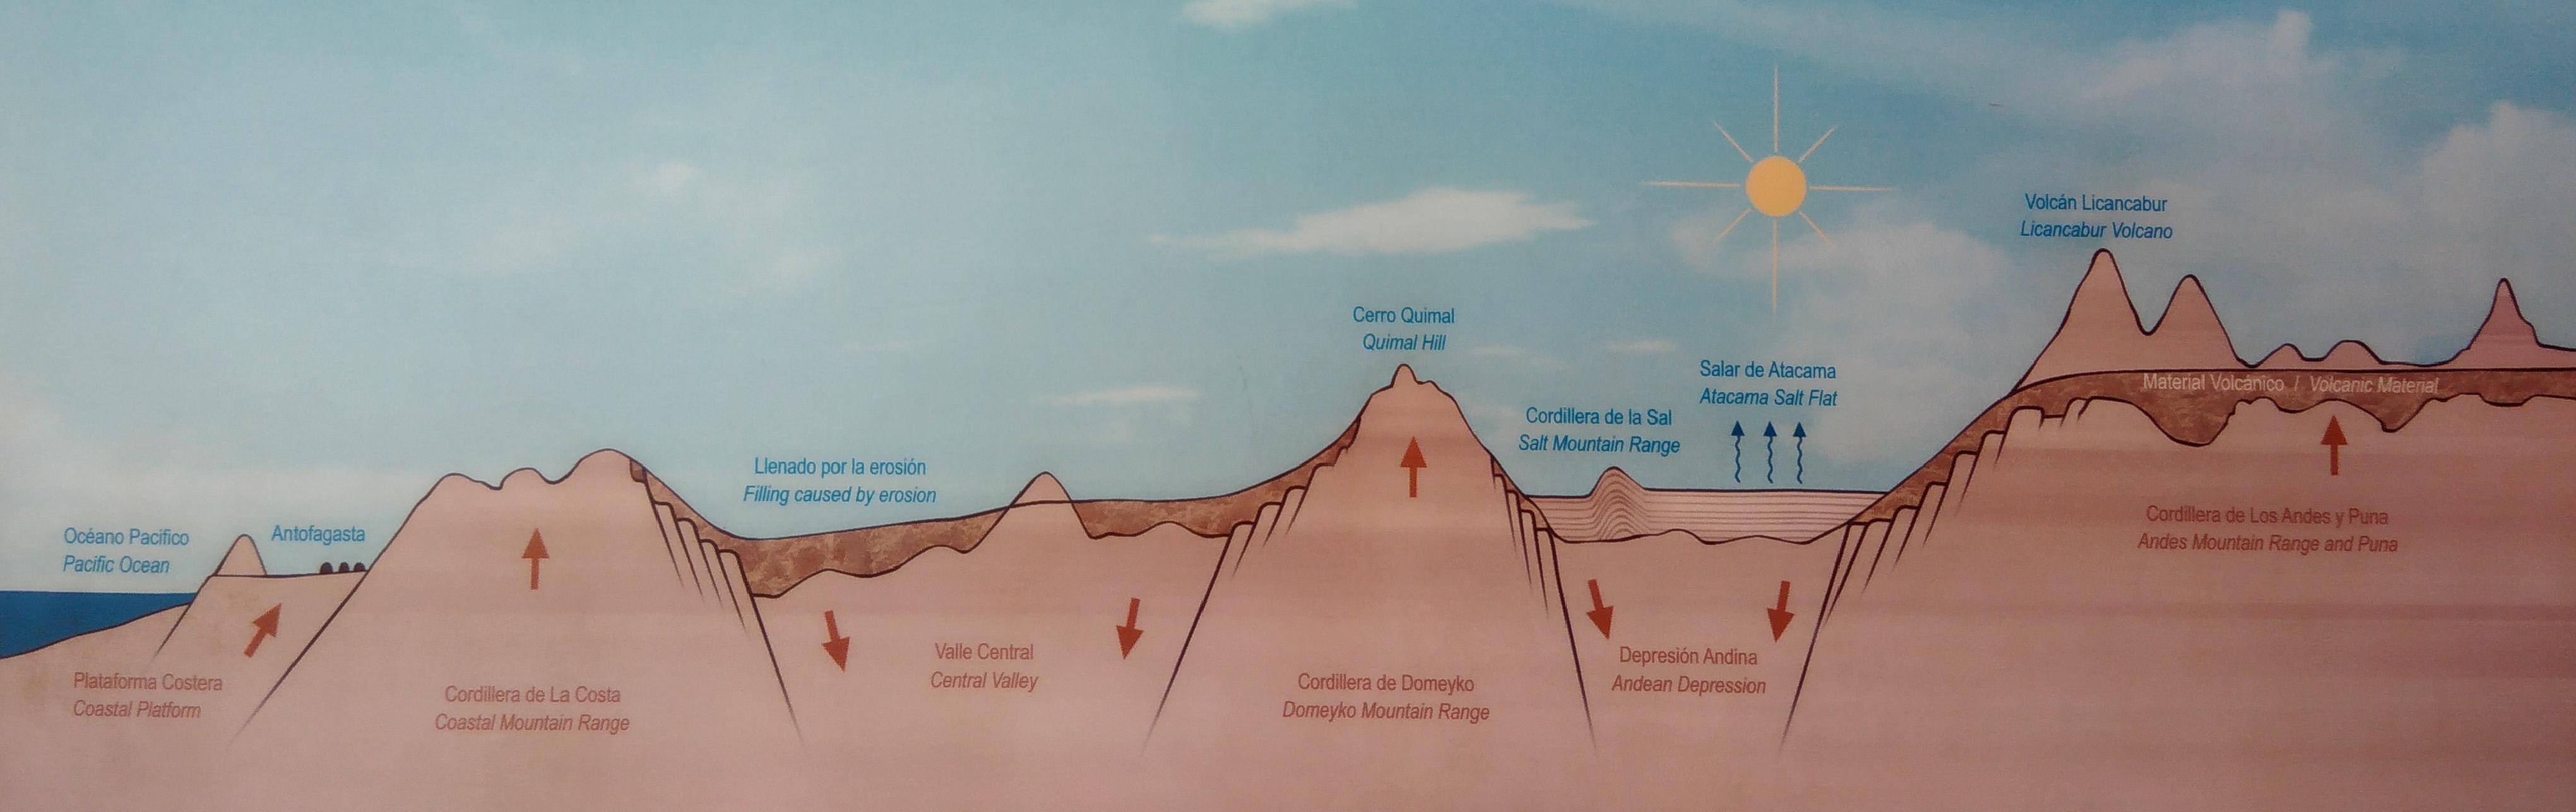 0111 0912 Mirador - Salar de Atacama 10jpg